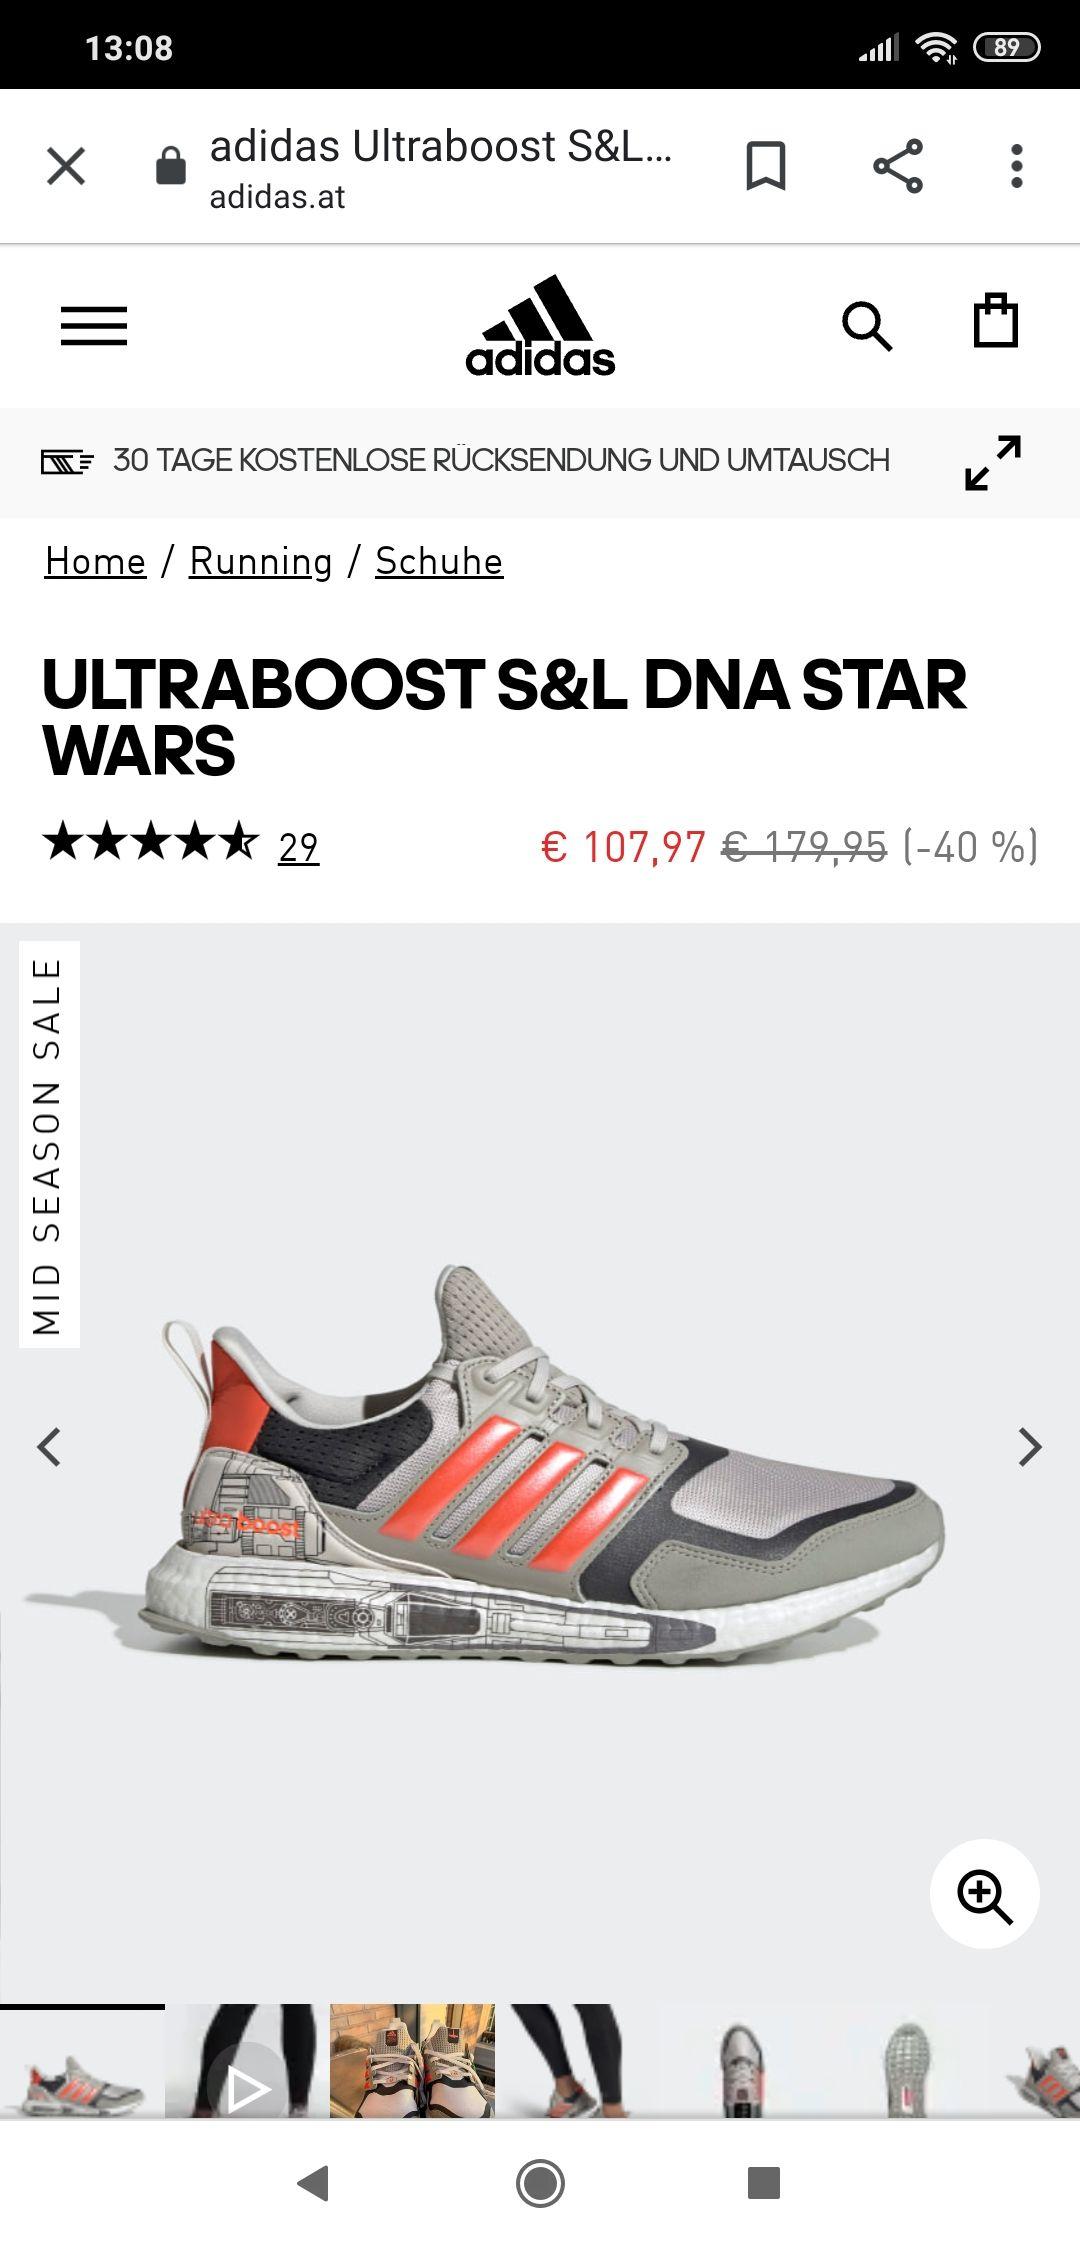 Adidas Ultraboost Star Wars Edition